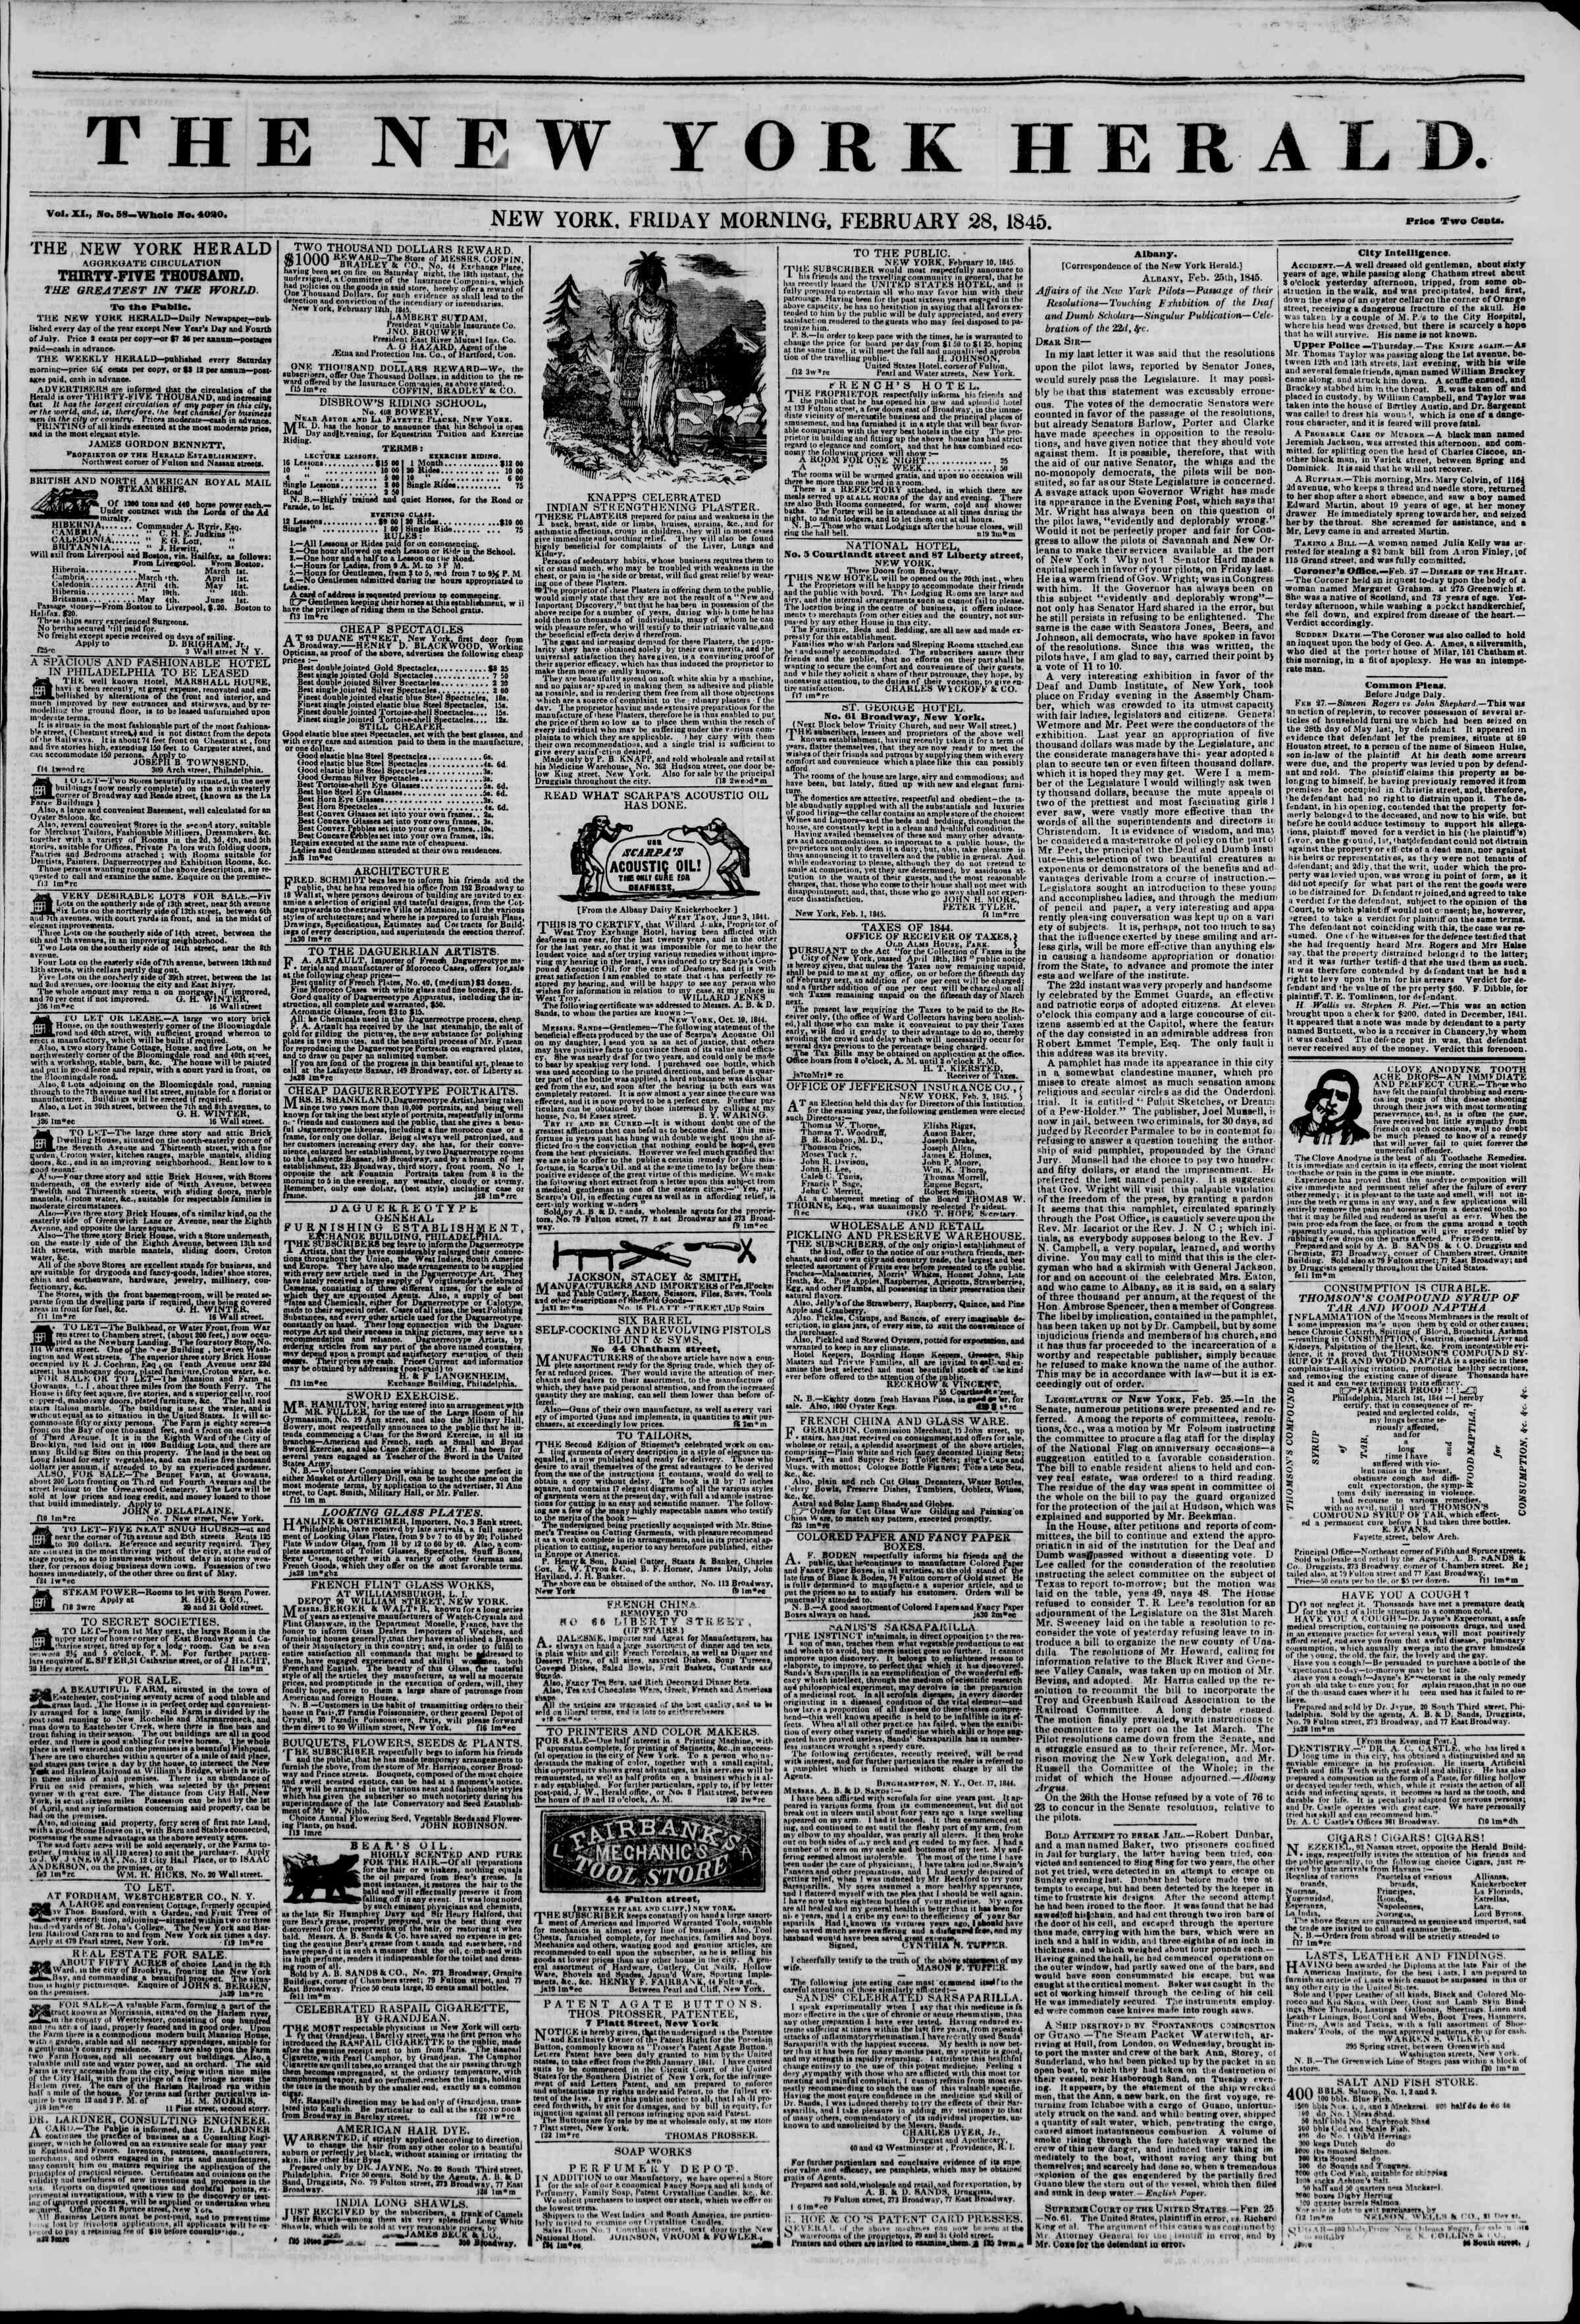 February 28, 1845 Tarihli The New York Herald Gazetesi Sayfa 1